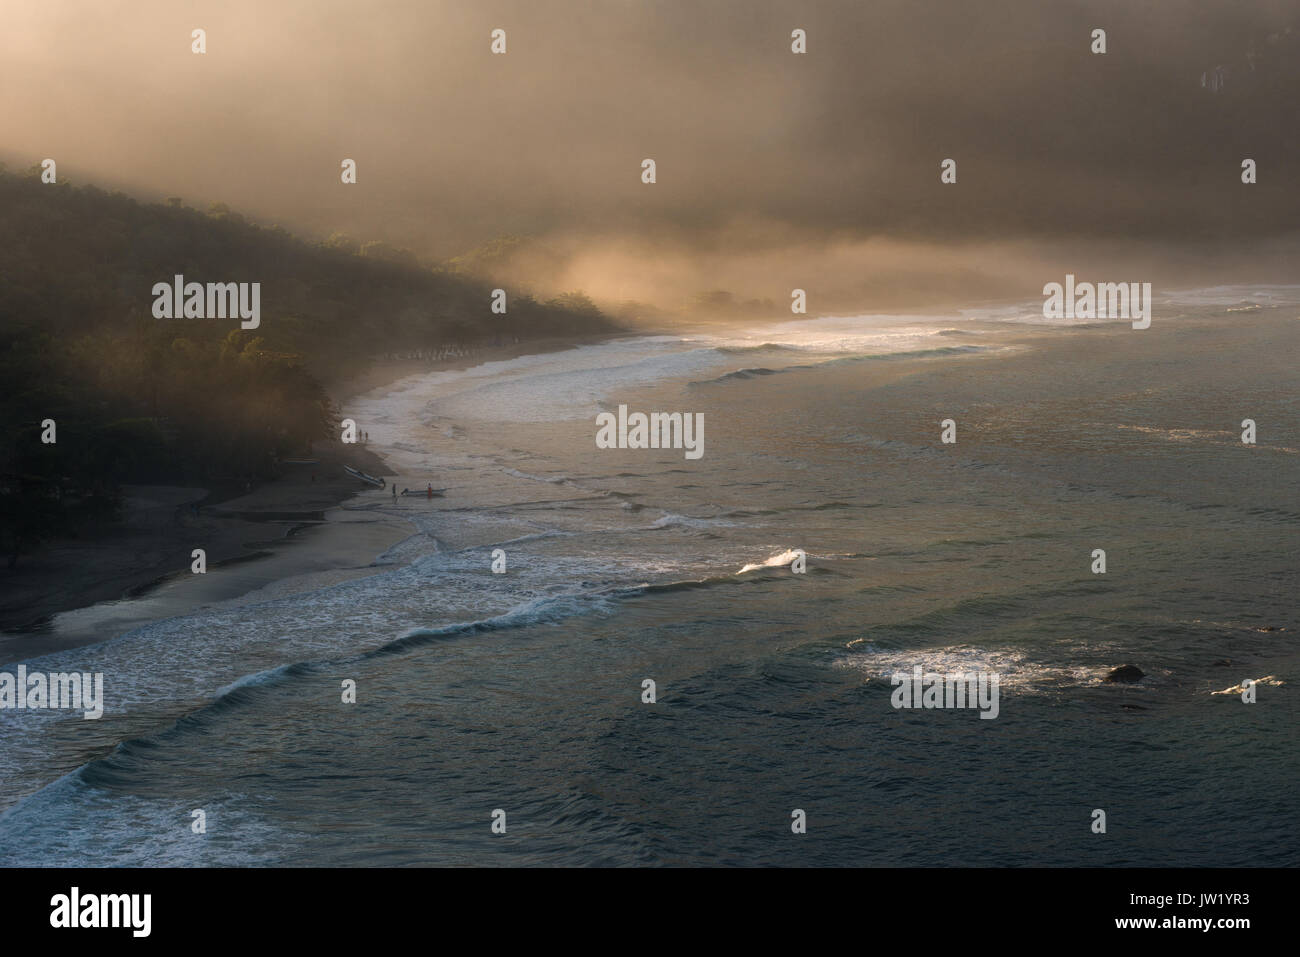 Castelhanos Beach in Ilhabela, Brazil - Stock Image